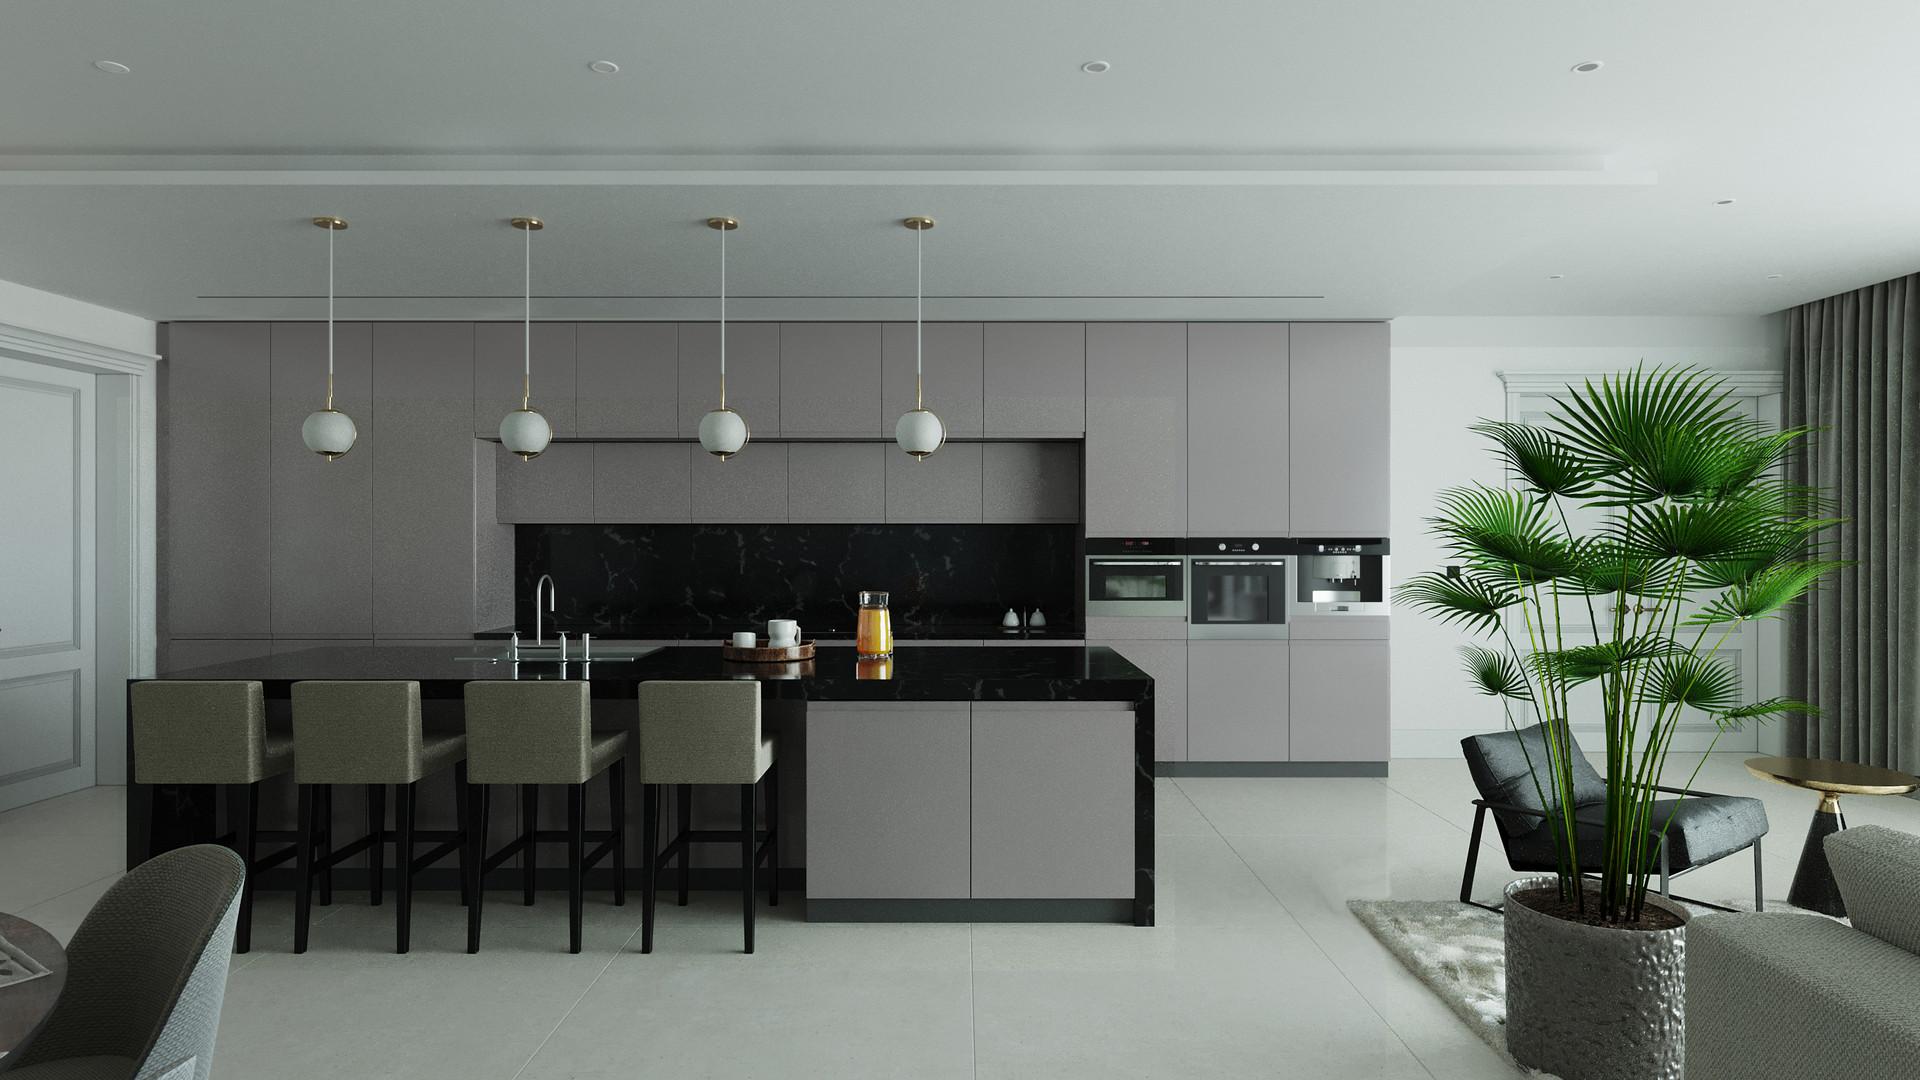 L_kitchen_01d.jpg